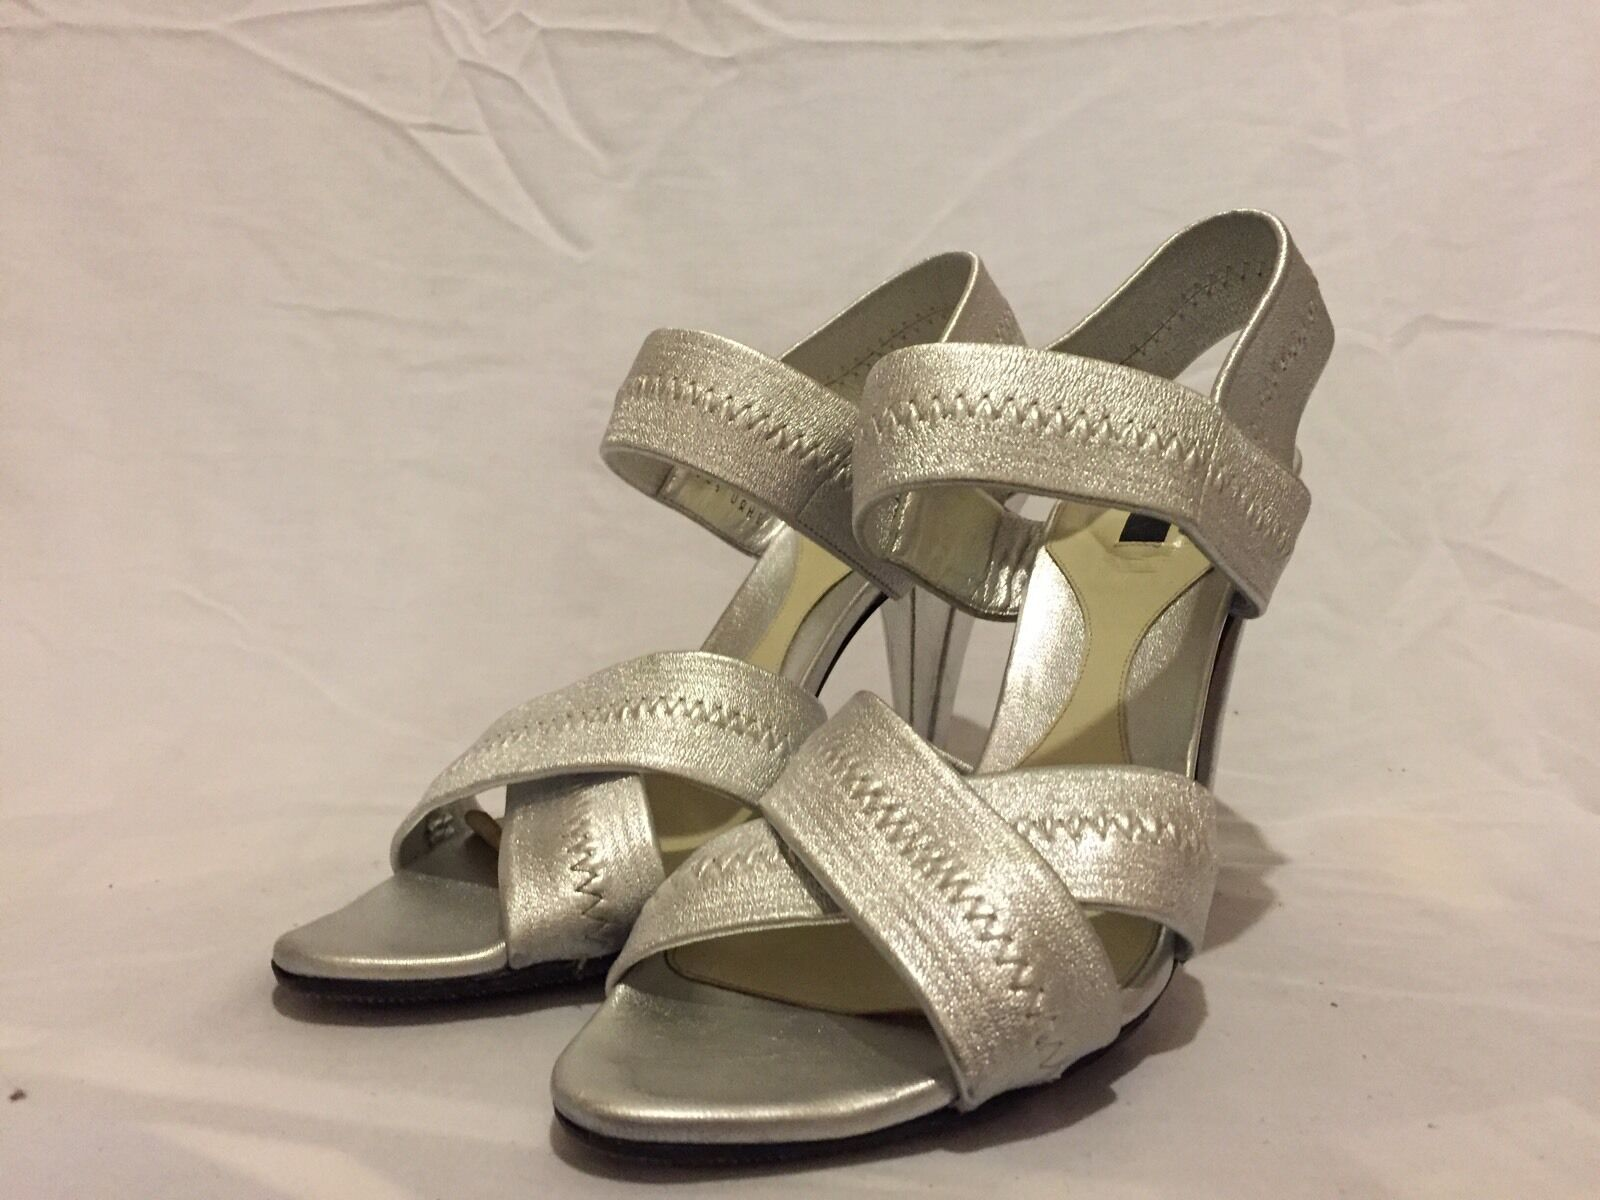 Bally Lynsey Leather Sandals Silver High Heels Us Sz 8 EU 38.5 EUC